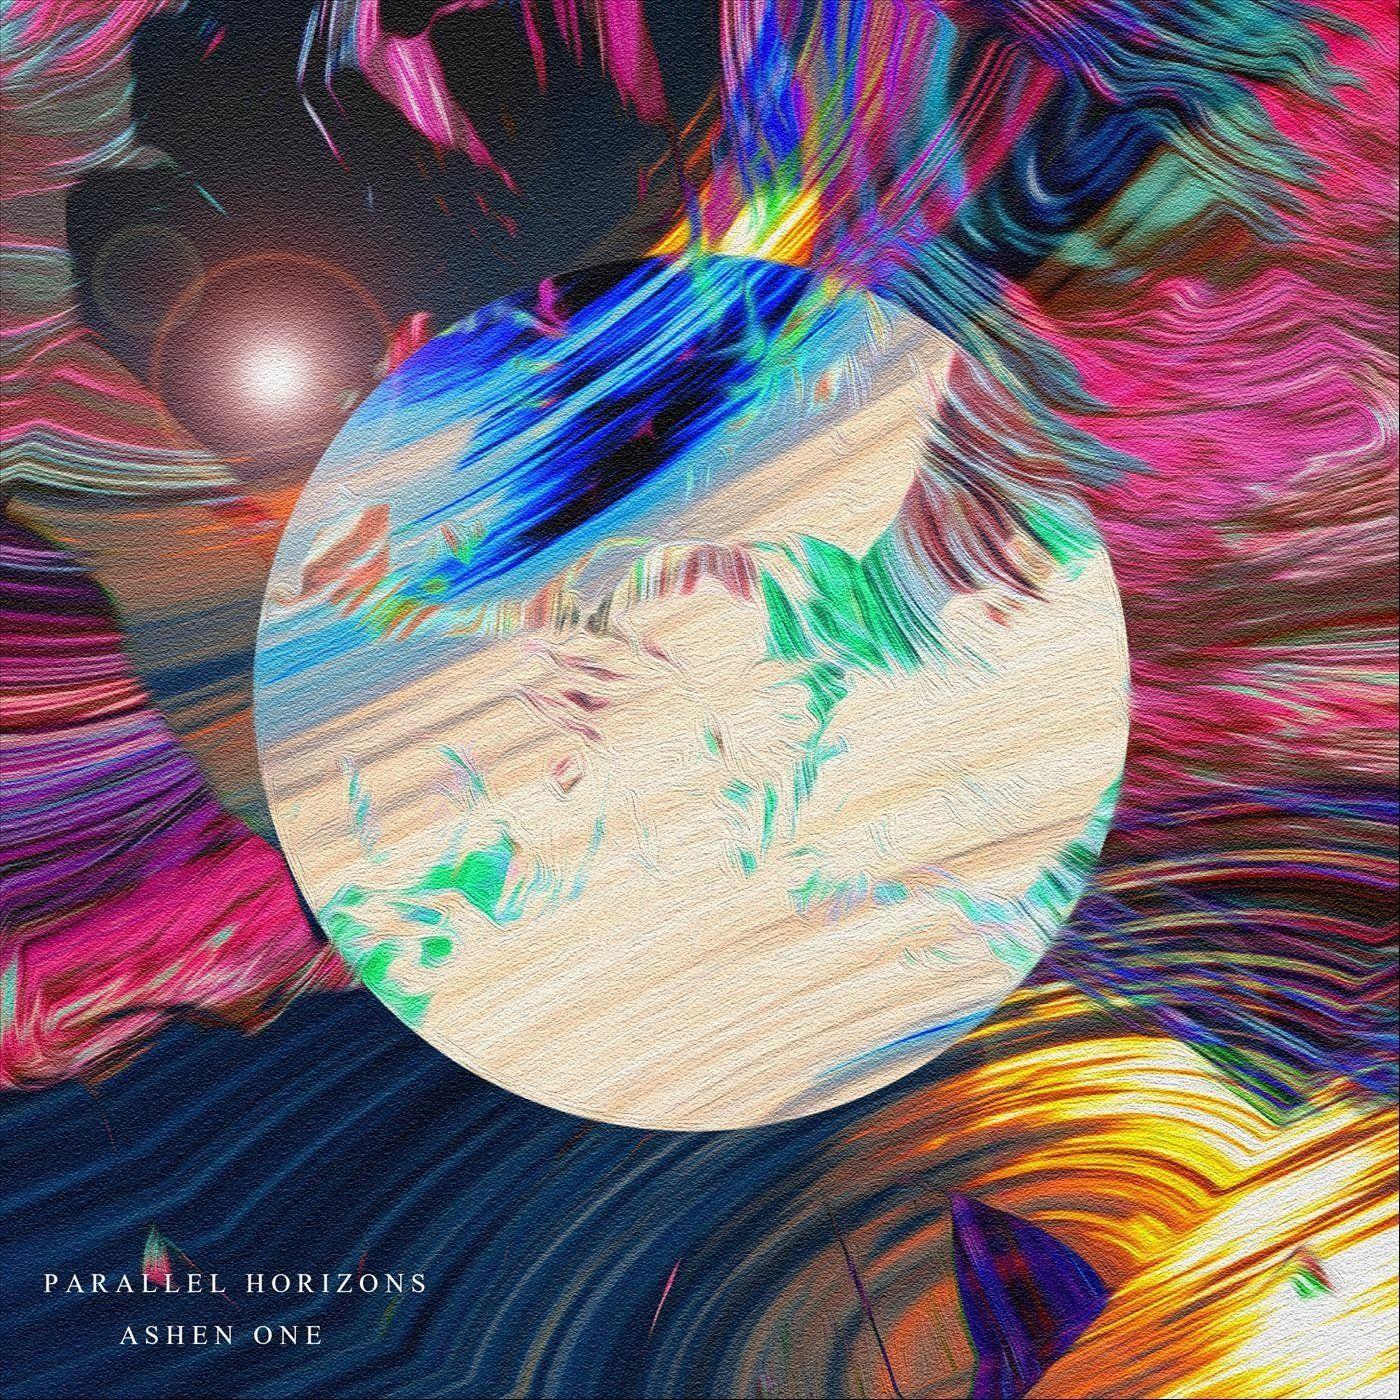 Parallel Horizons - Ashen One [single] (2020)